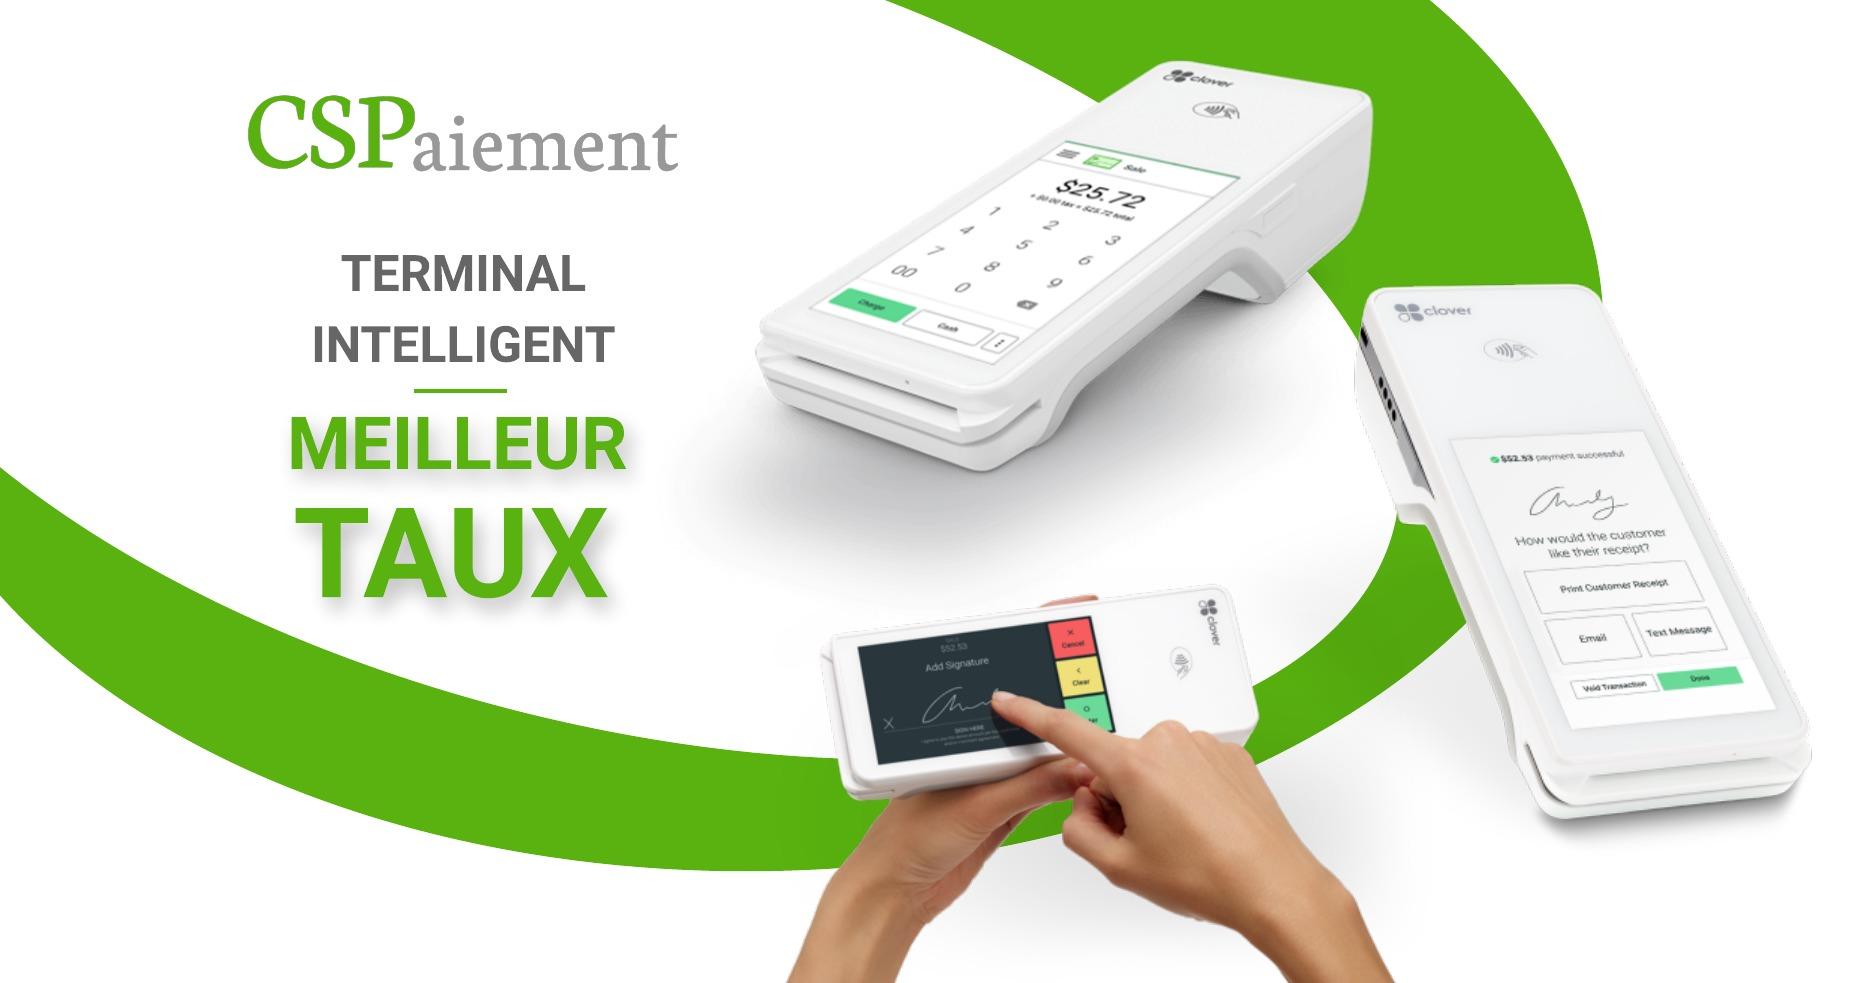 clover flex, terminal de paiement, machine interac, machine de paiement, terminal clover, terminal clover flex